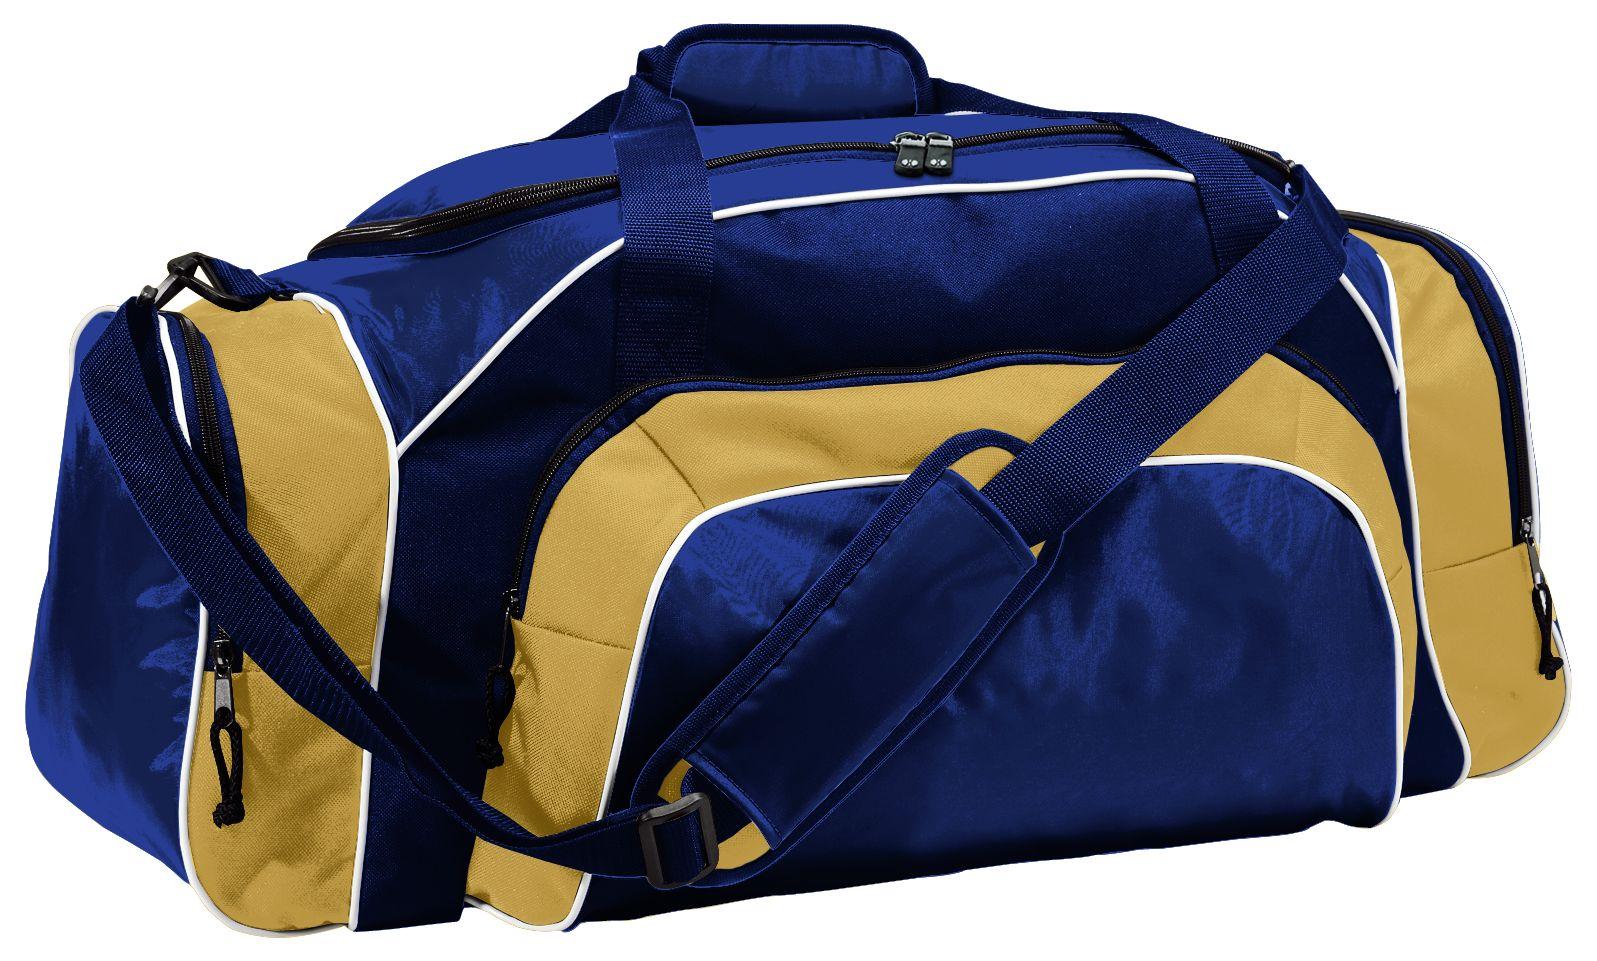 Tournament Duffel Bag - NAVY/VEGAS GOLD/WHITE